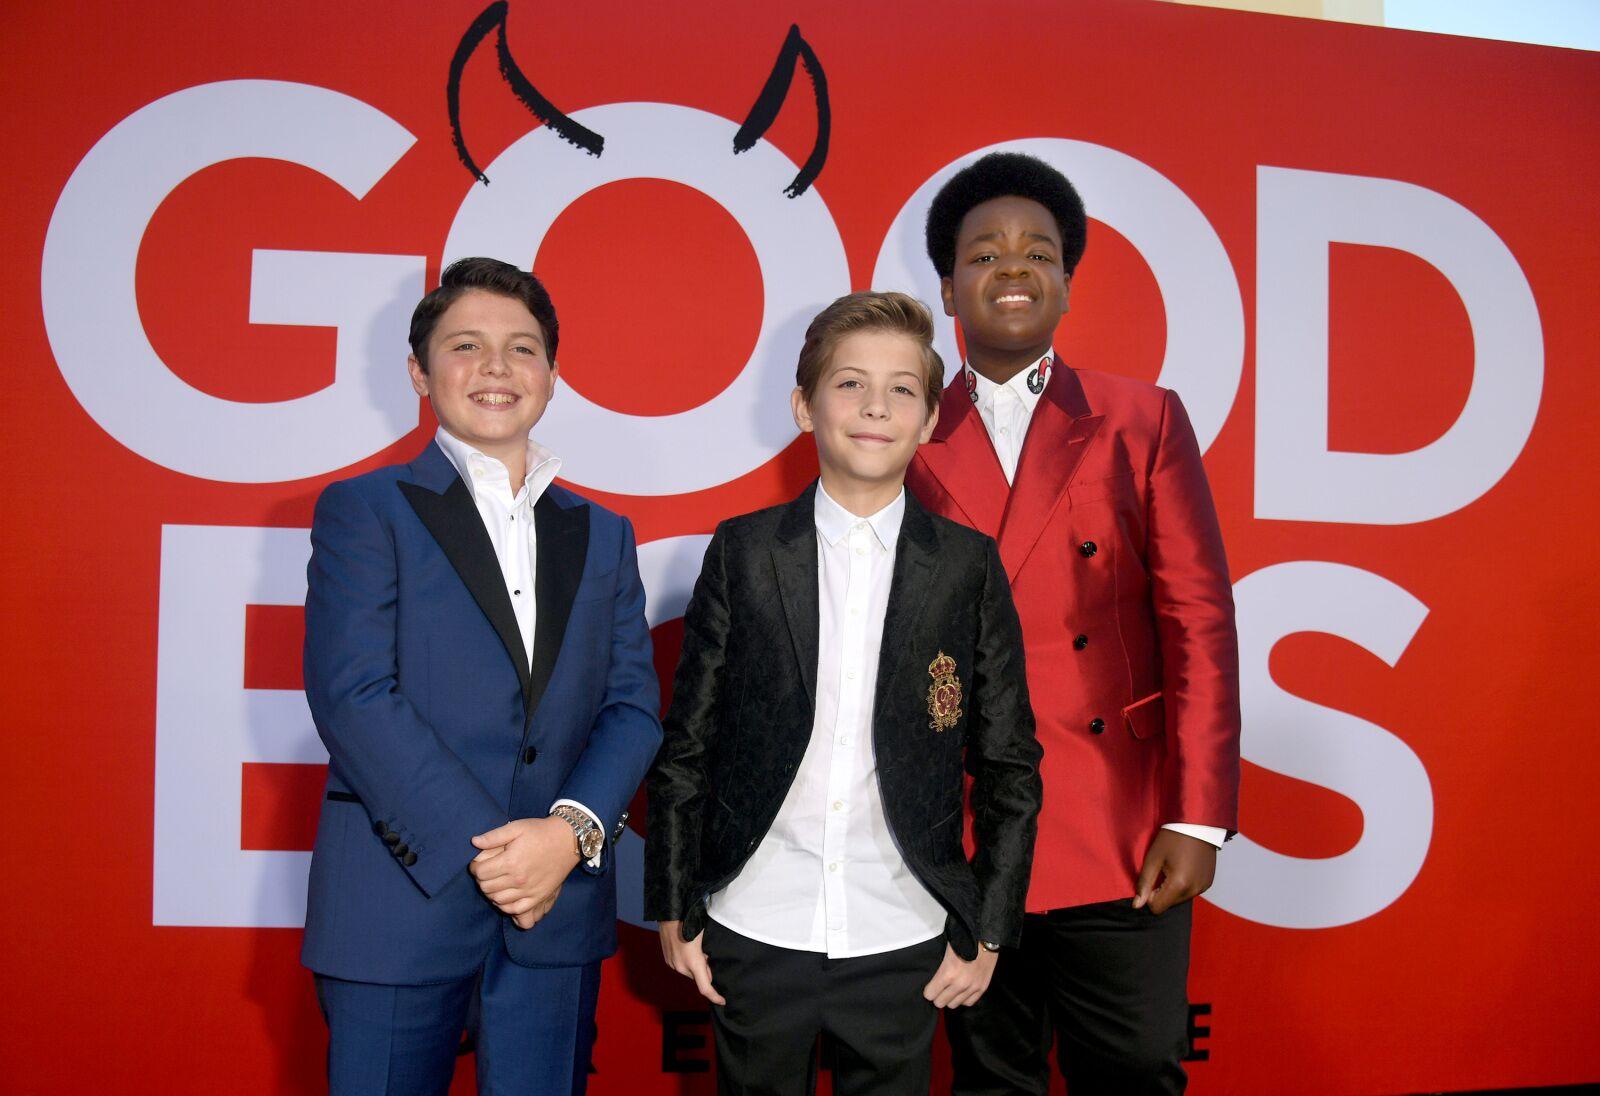 Good Boys is 2019's most surprisingly heartfelt raunchy comedy